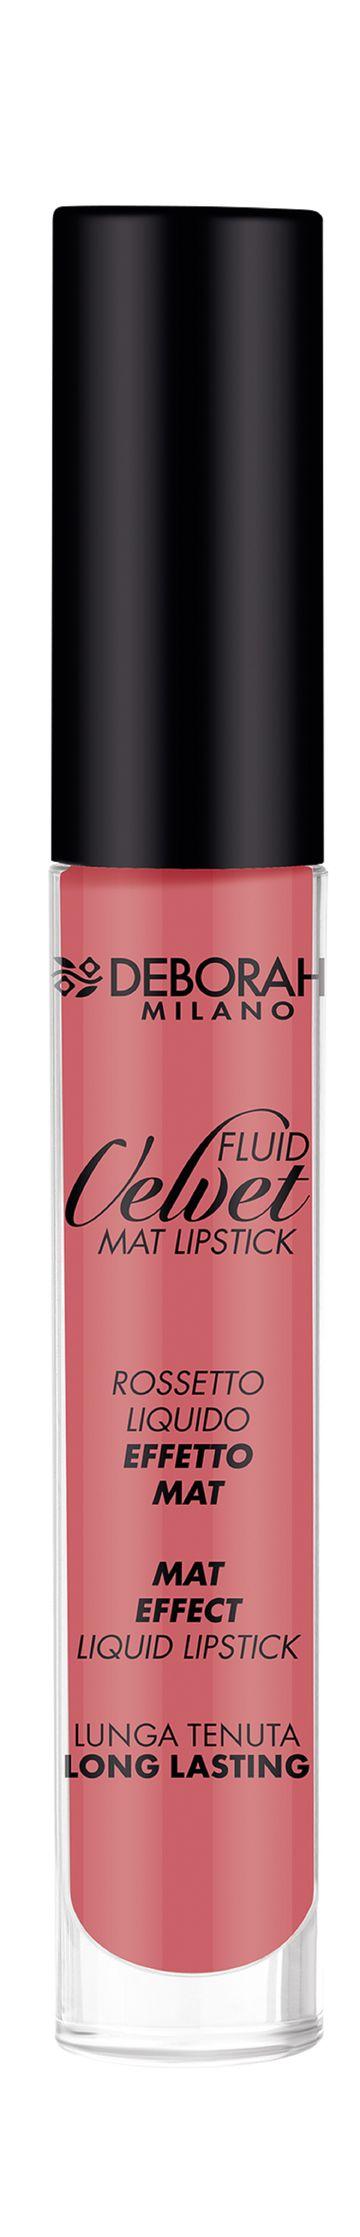 Deborah Milano | Fluid Velvet Mat - 2 Romantic Pink